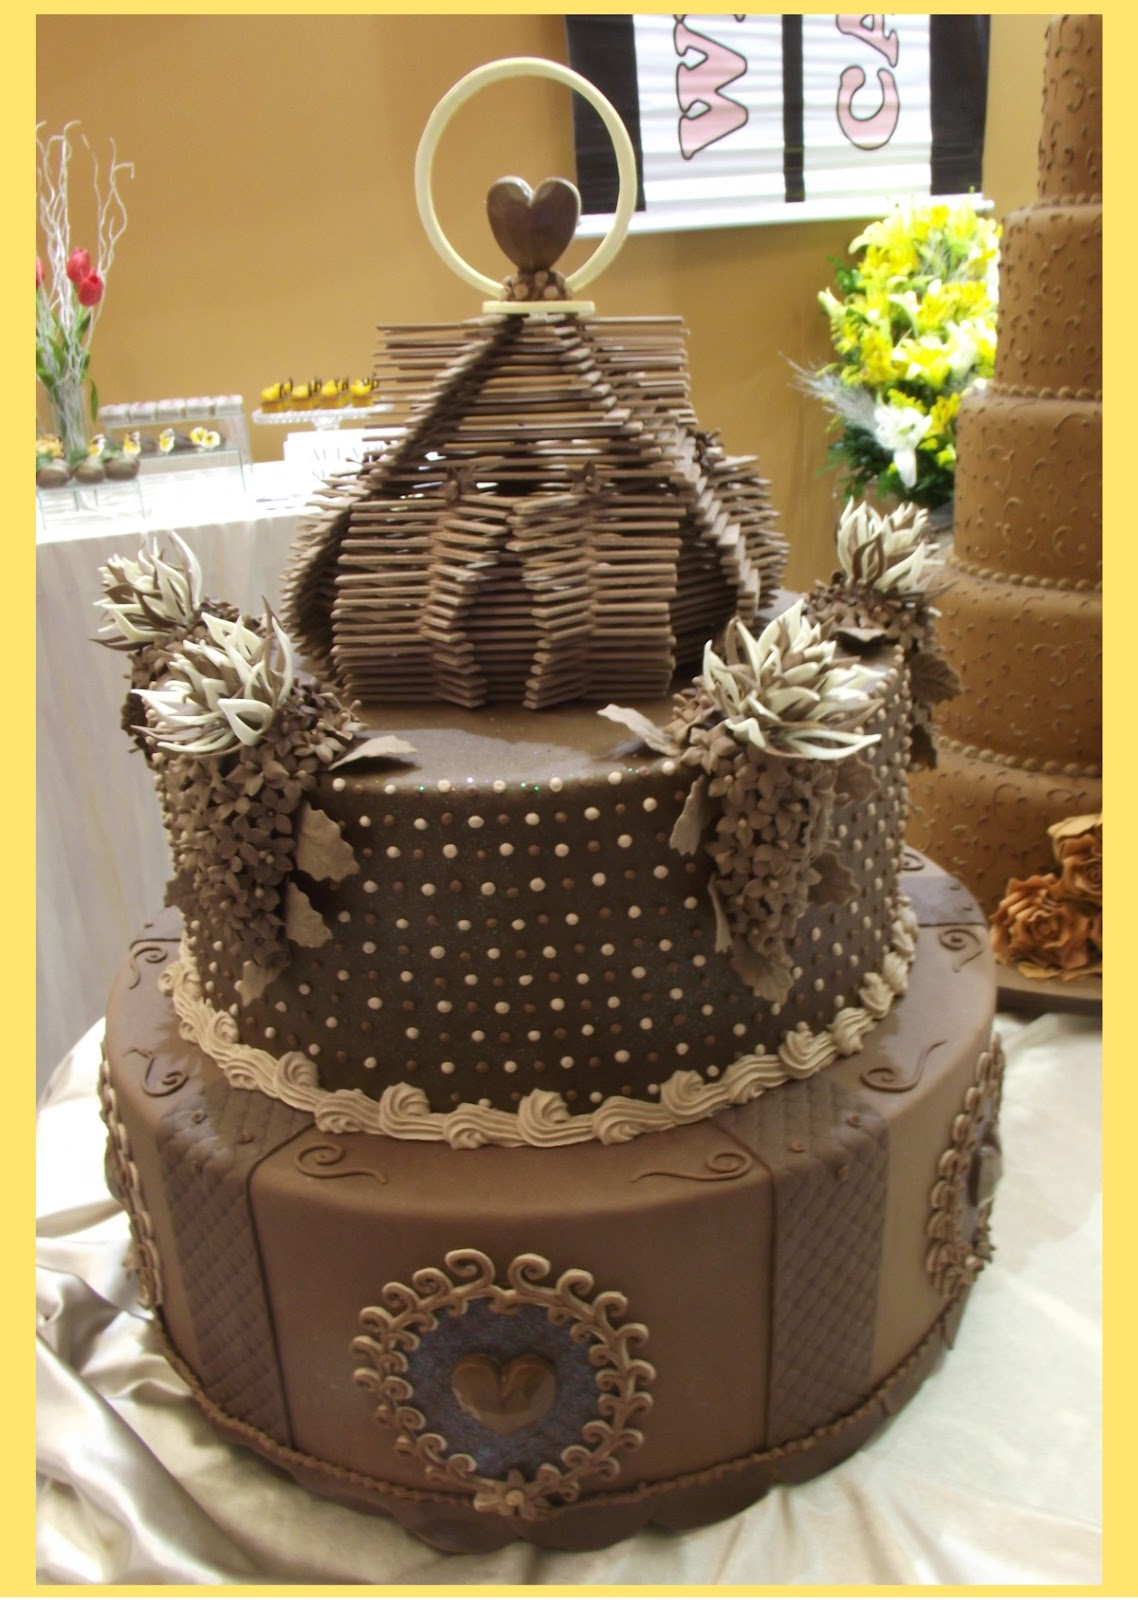 Blog Deli Art Cake Creations : Exposicao de Bolos Deli Art Cake Creations